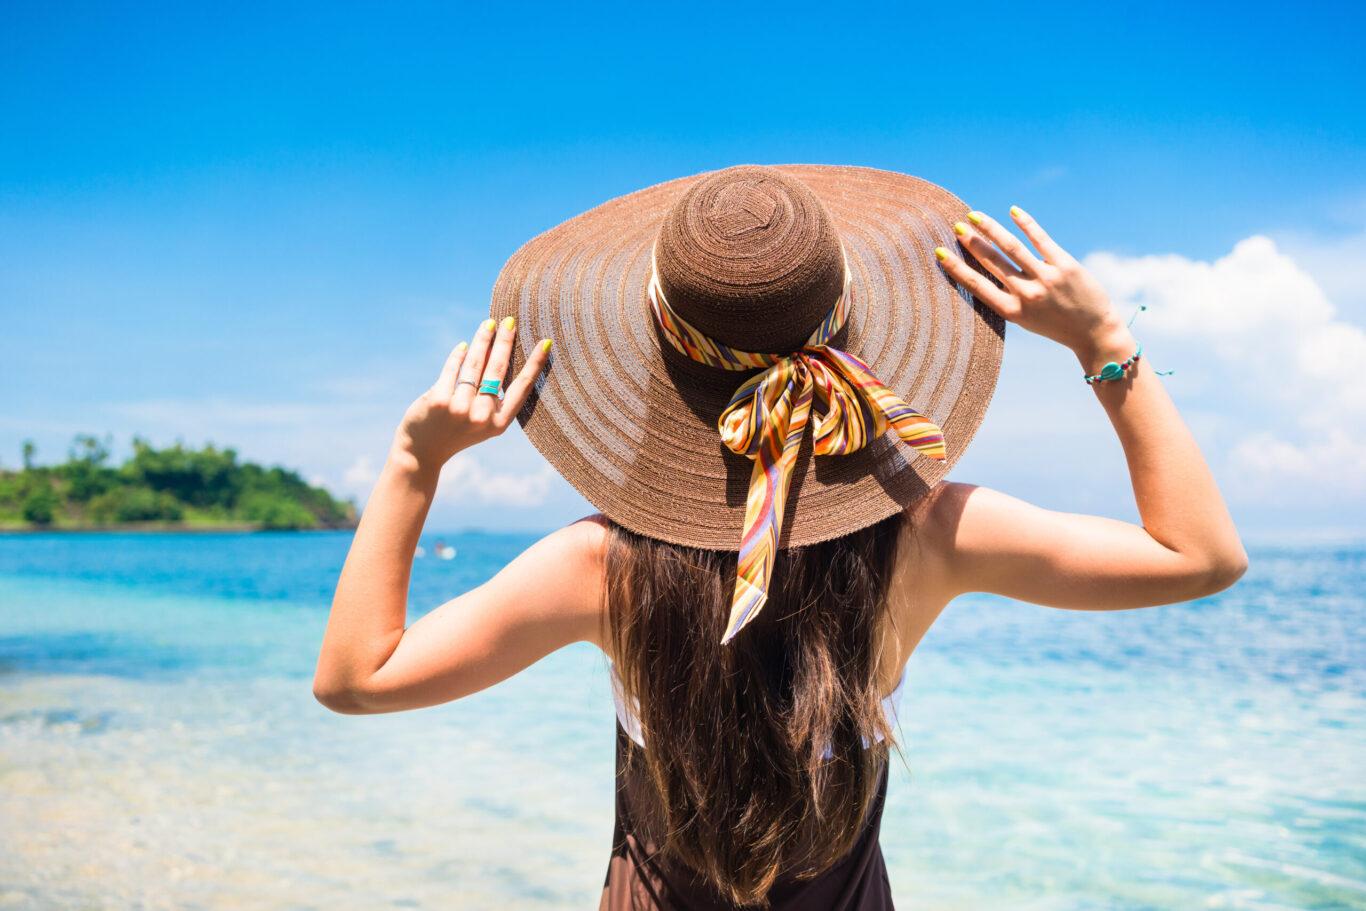 plajda-şapka-takan-kadın